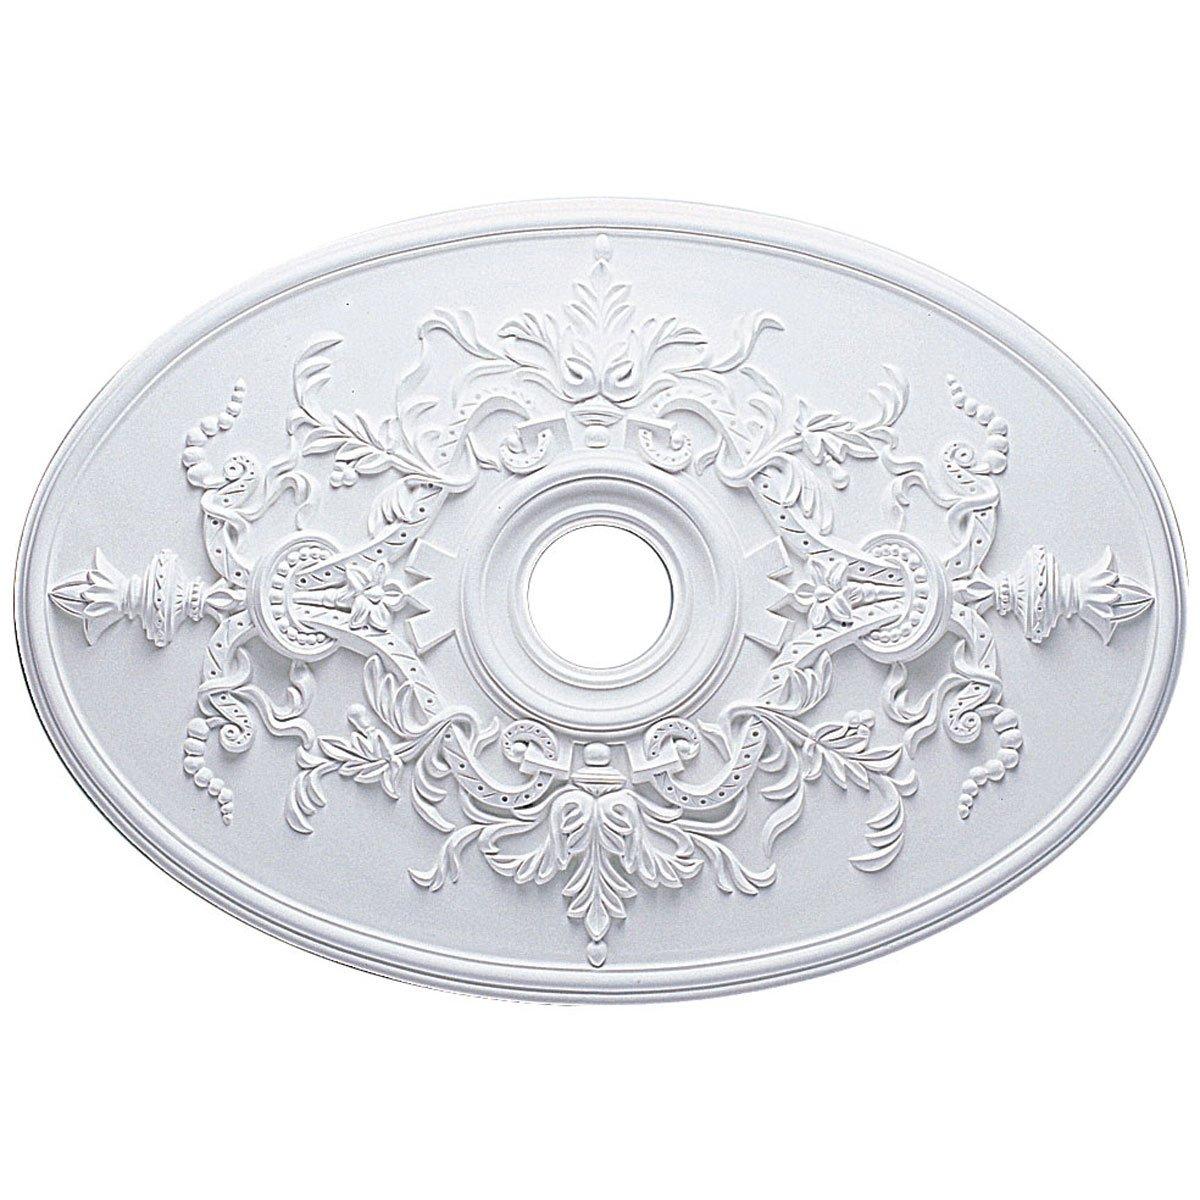 Ekena Millwork CM21X30AL 21 1/4-Inch W x 30 3/4-Inch H x 1 5/8-Inch P Alexa Ceiling Medallion (Fits Canopies up to 5 5/8'')